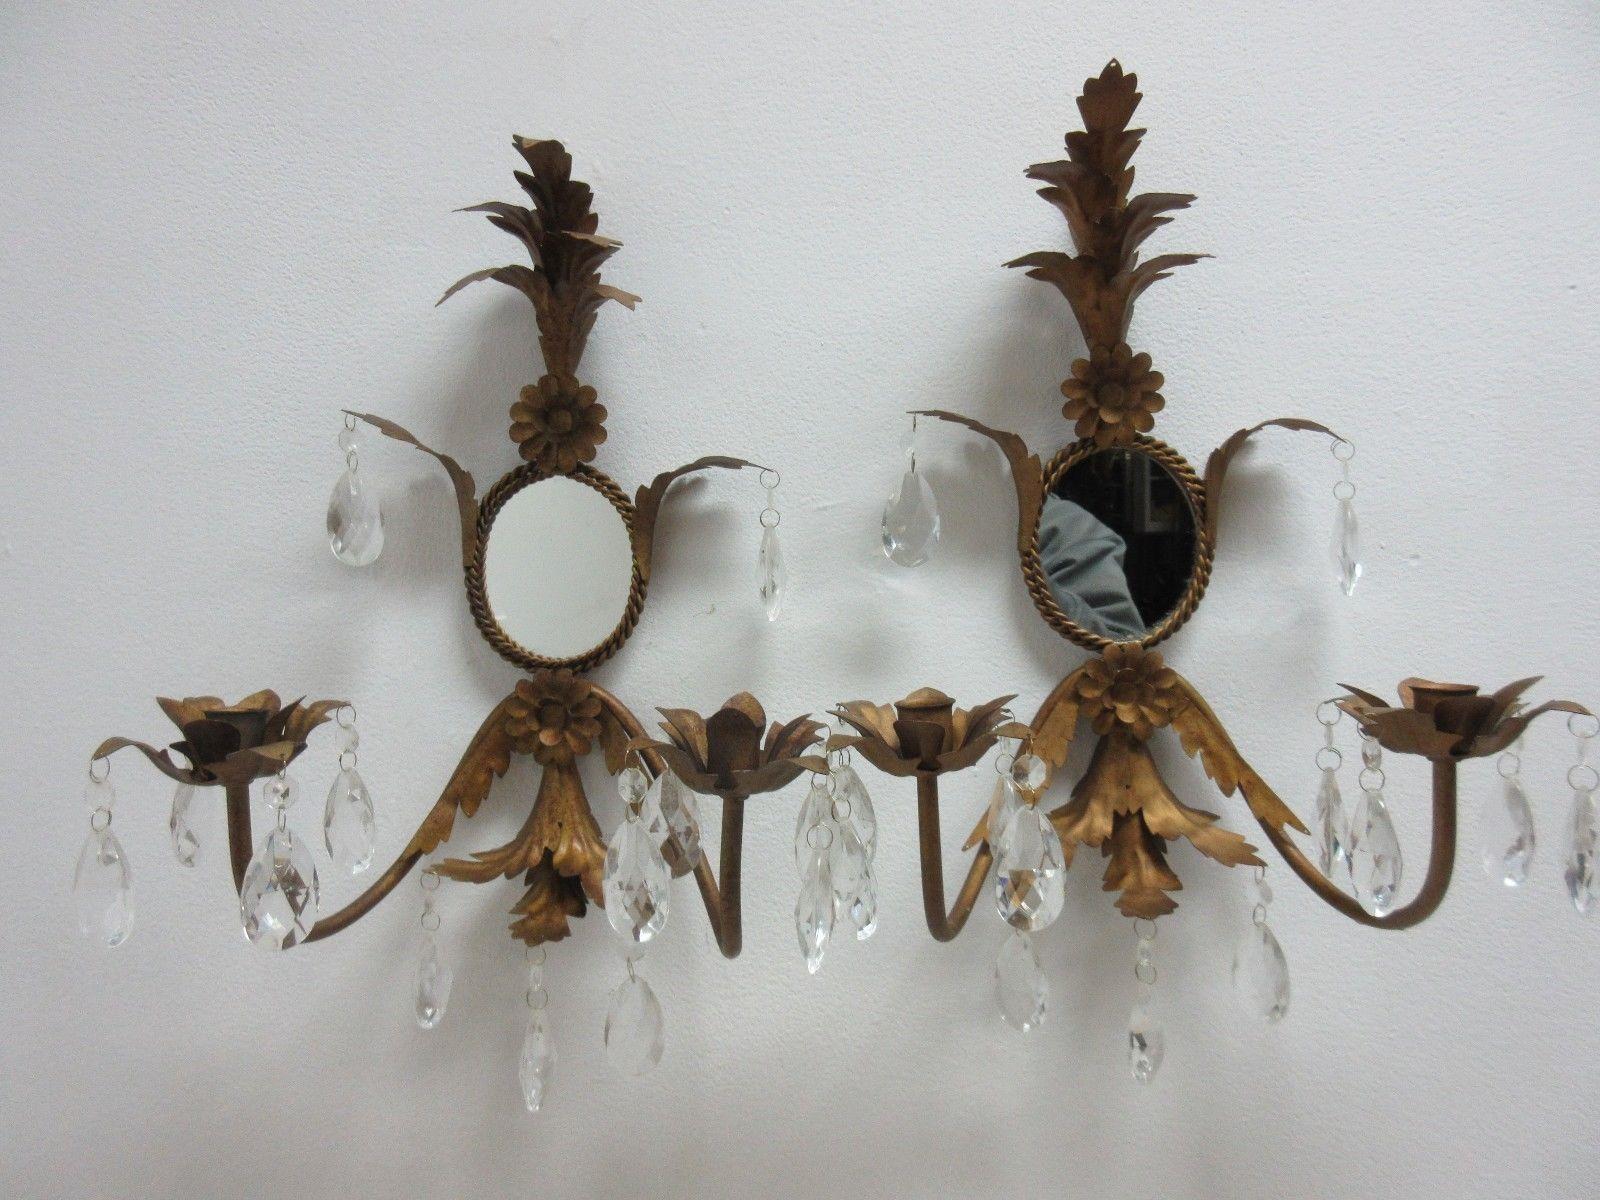 French Regency Metal Leaf Gold Wall Sconces